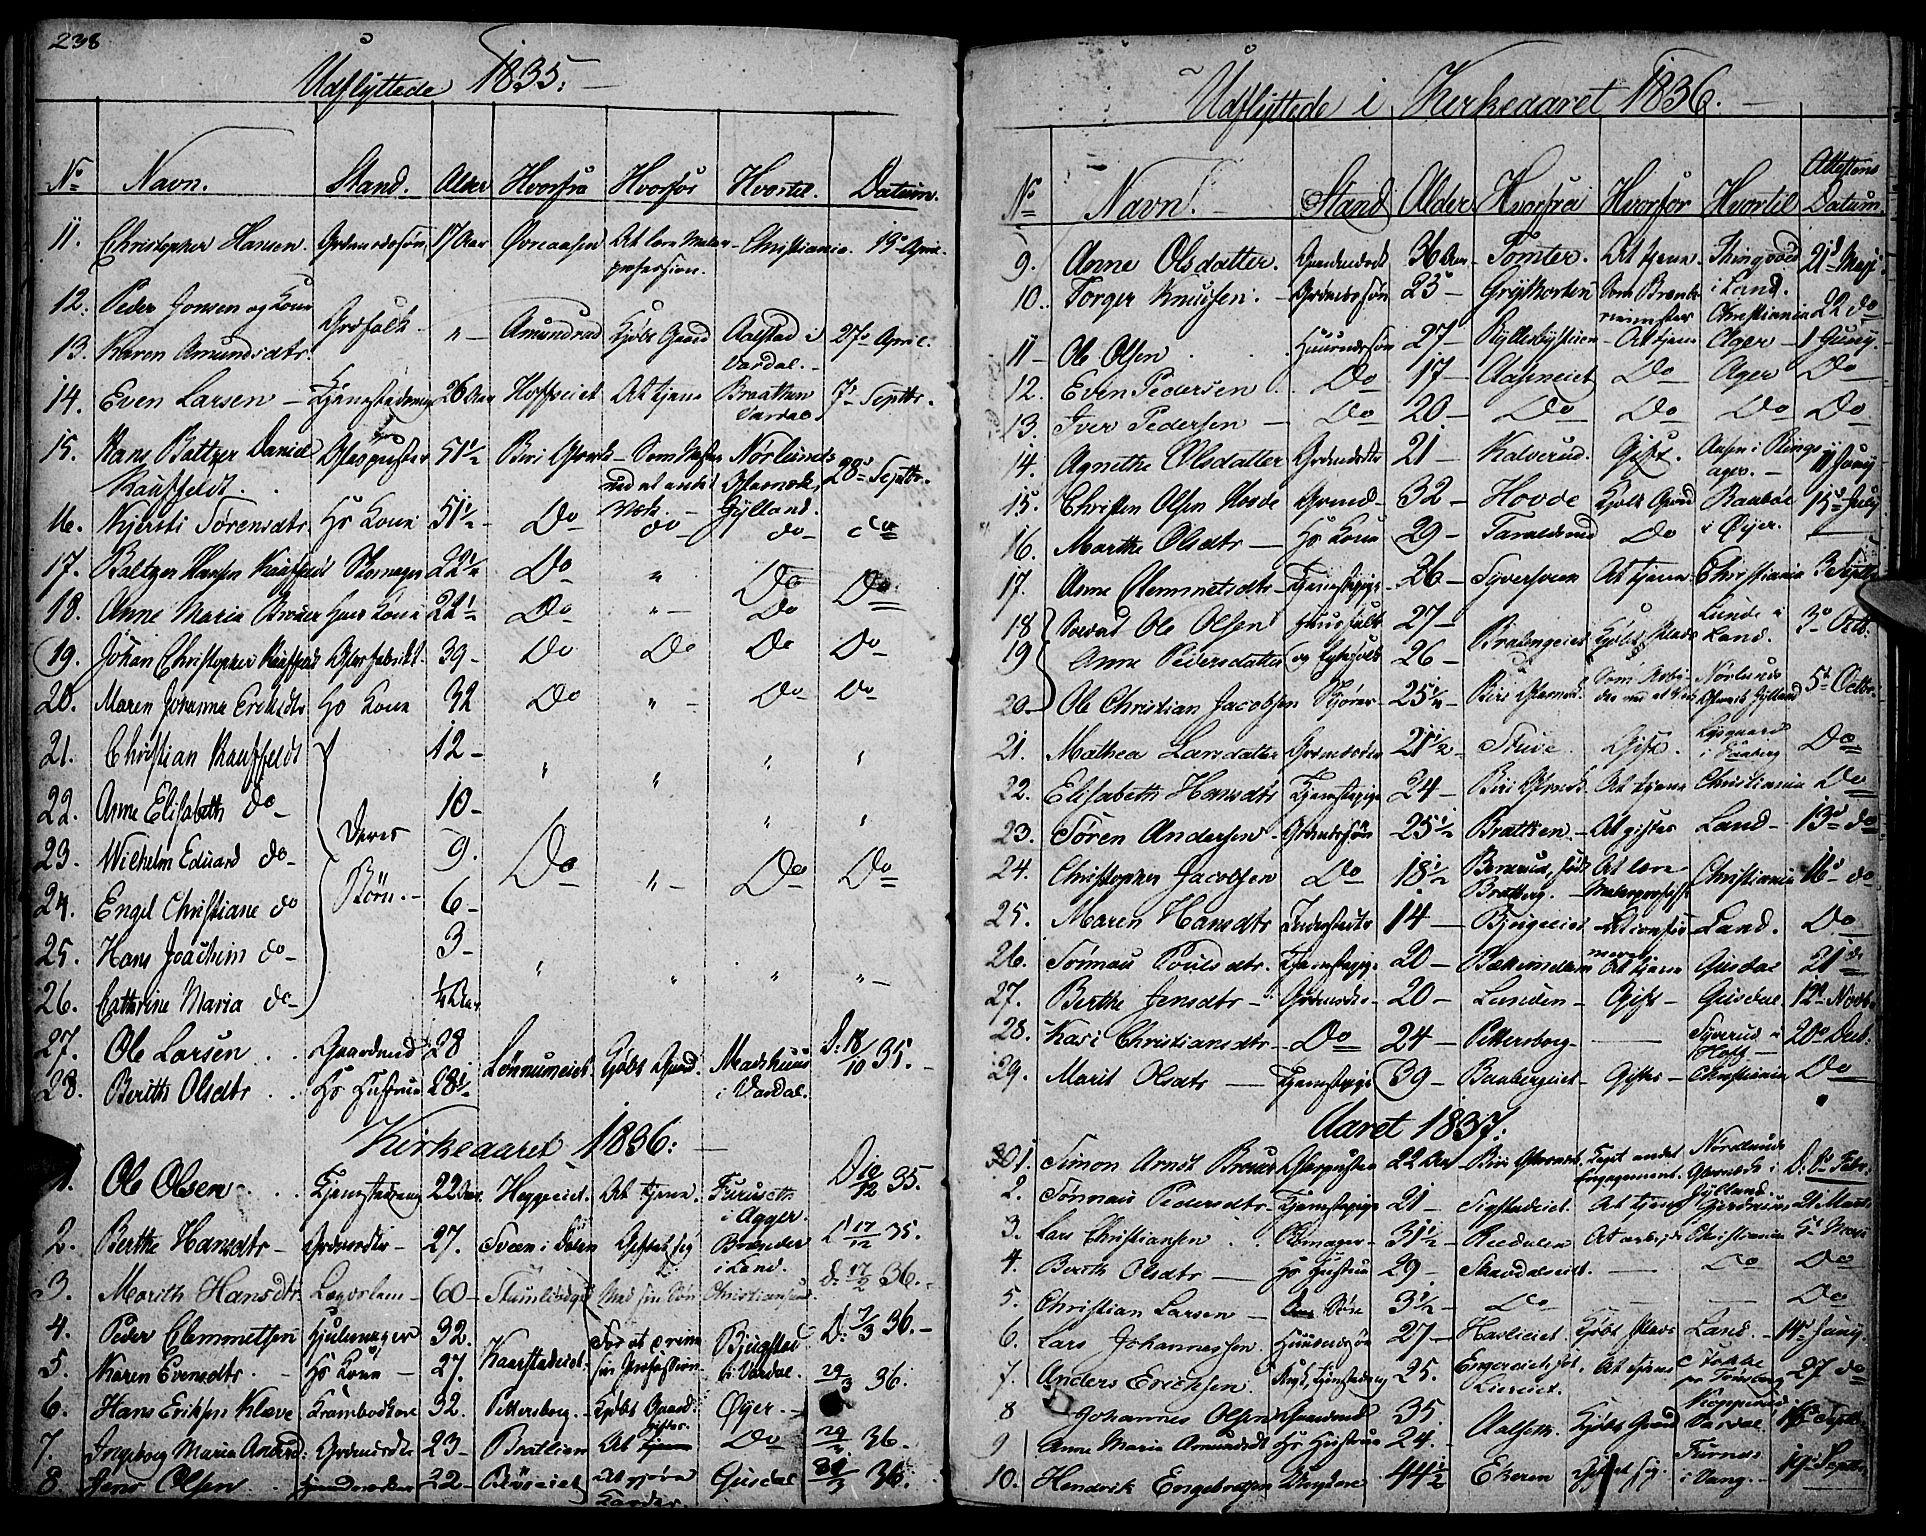 SAH, Biri prestekontor, Ministerialbok nr. 4, 1829-1842, s. 238